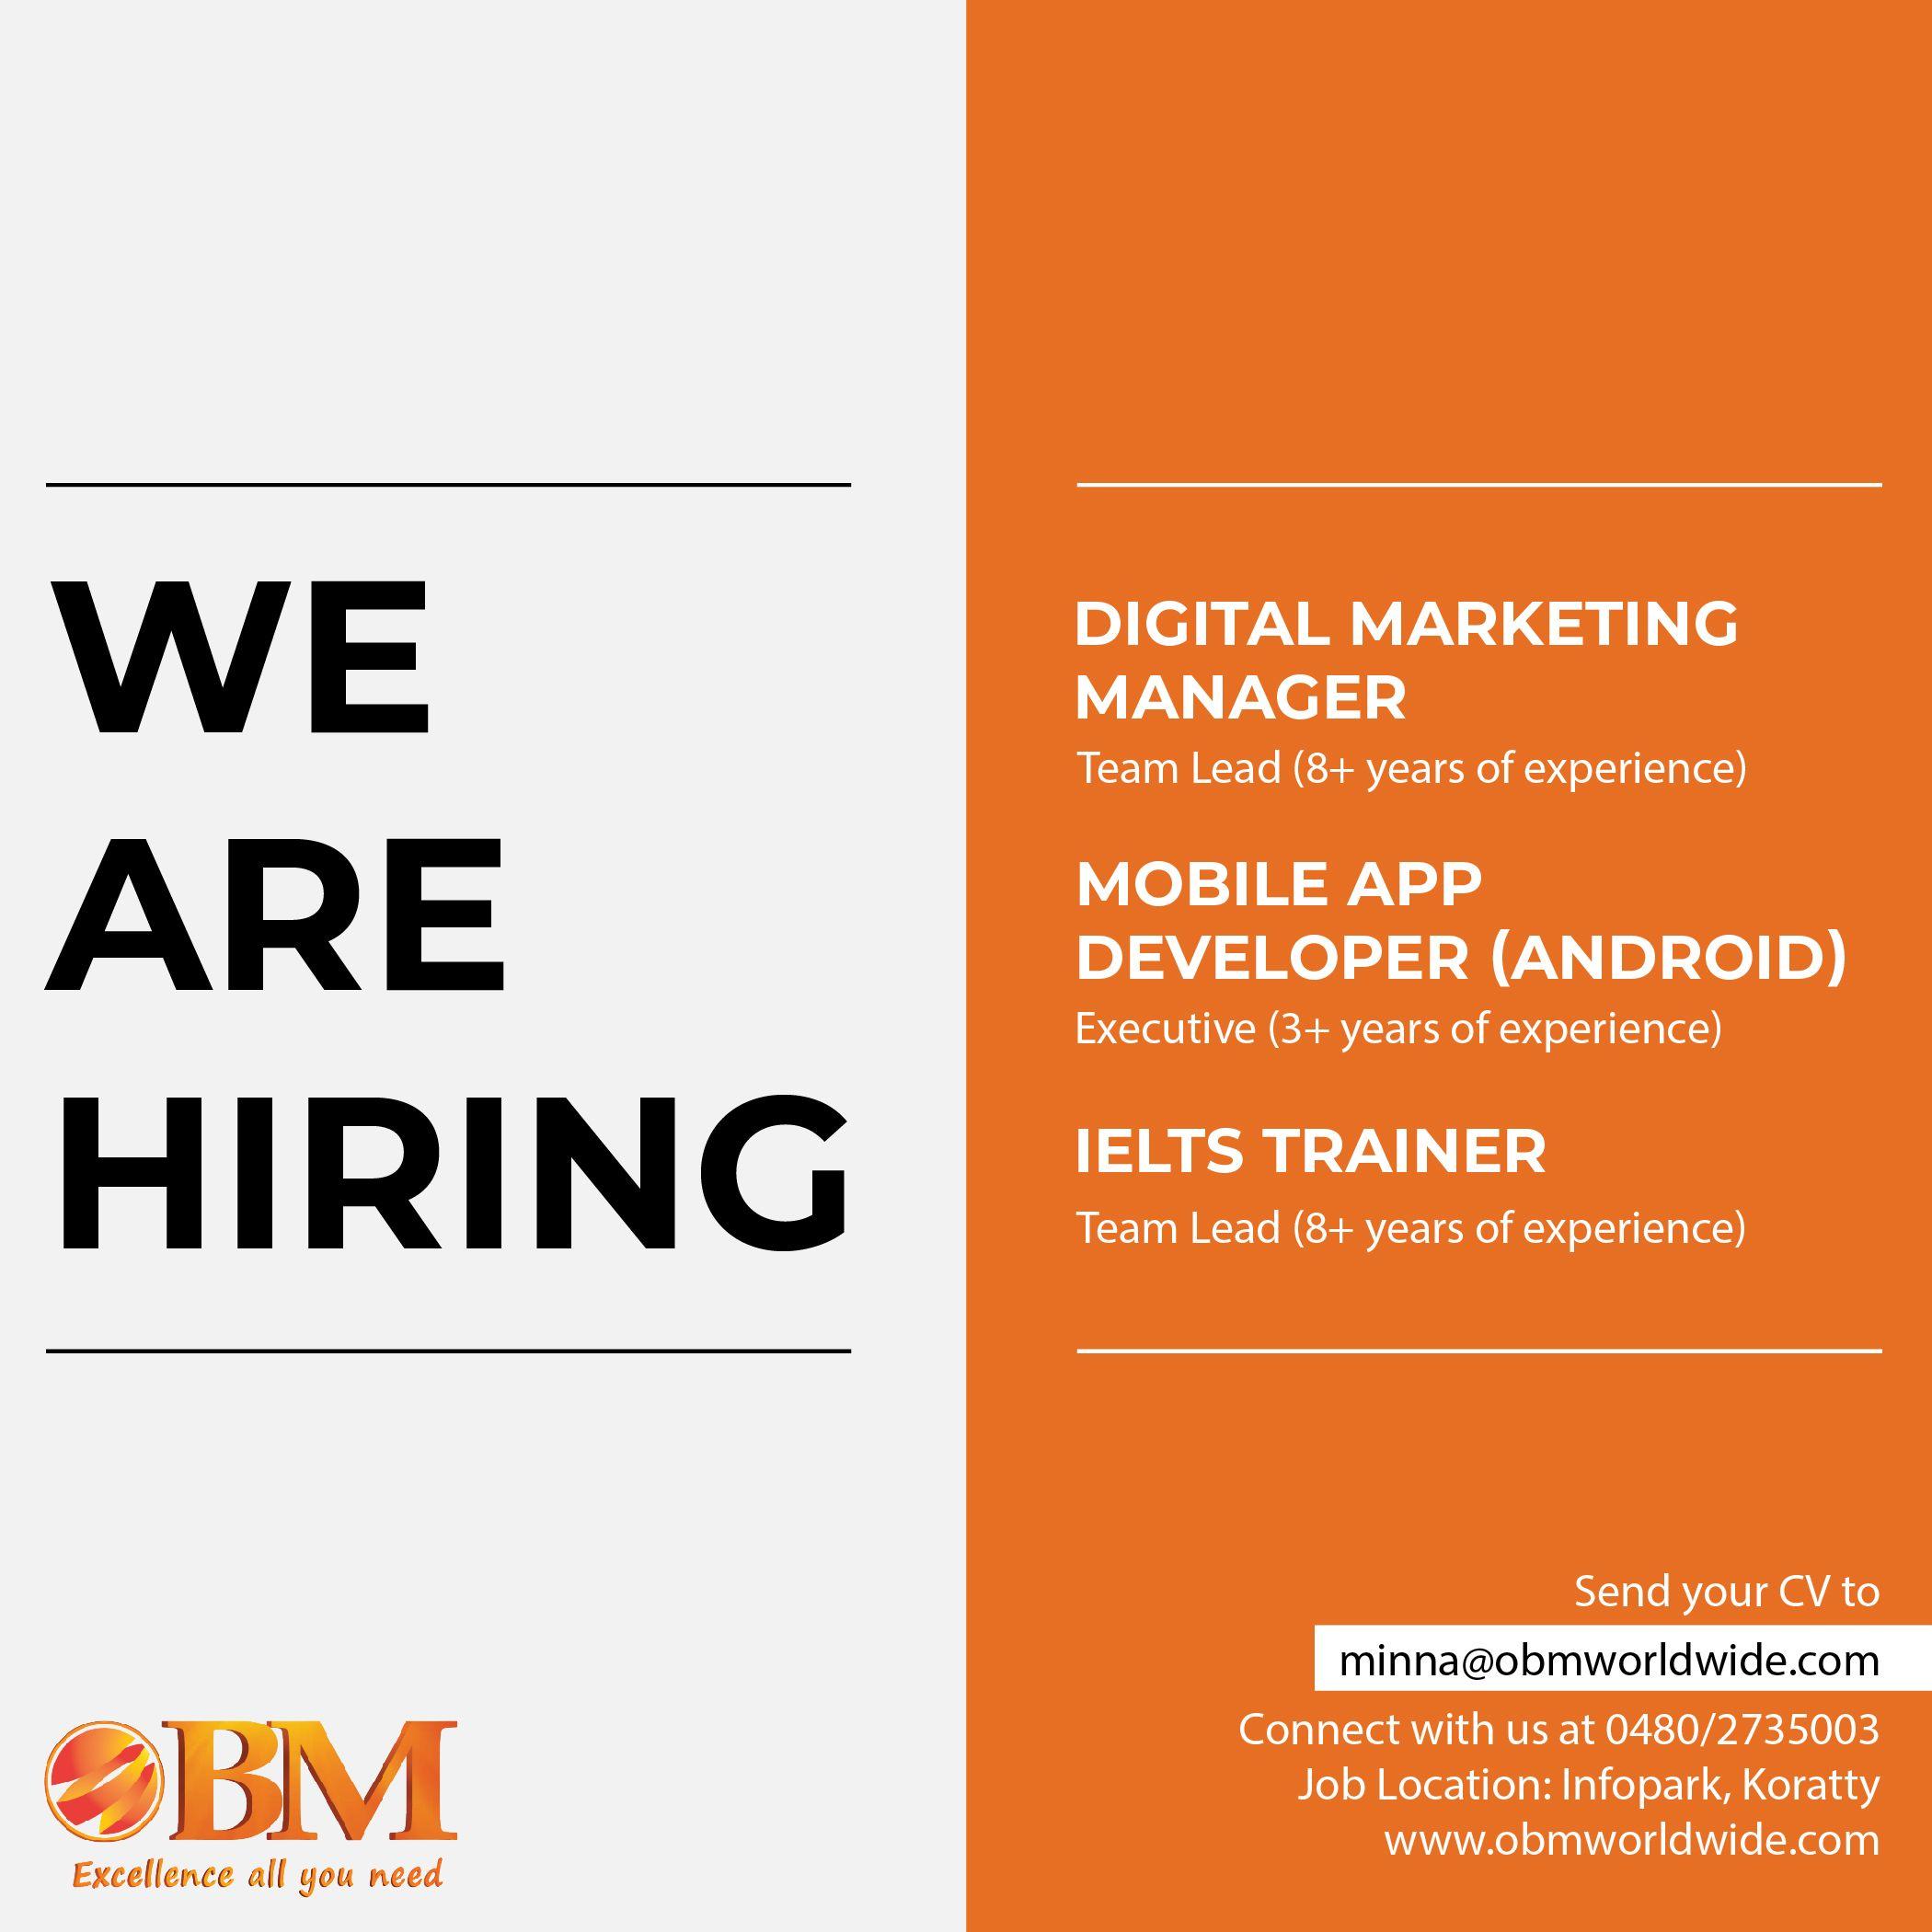 We Are Hiring Digitalmarketingmanager Mobileappdeveloper Ieltstrainer Digital Marketing Manager Business Finance Business Management